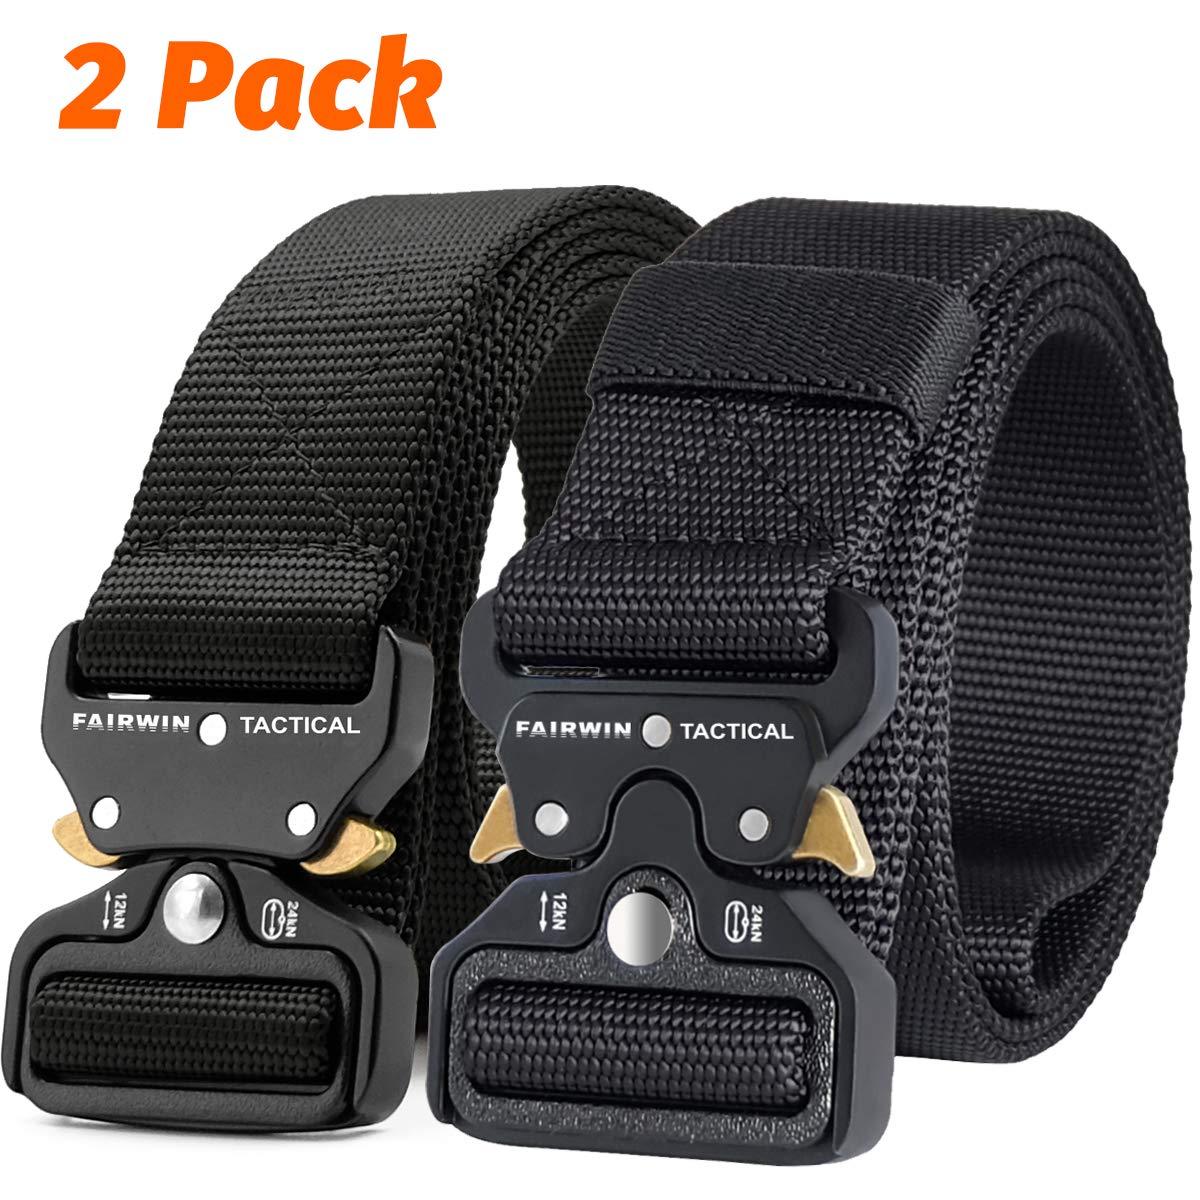 Fairwin Tactical Belt, 2 PCS 1.5 Inch Military